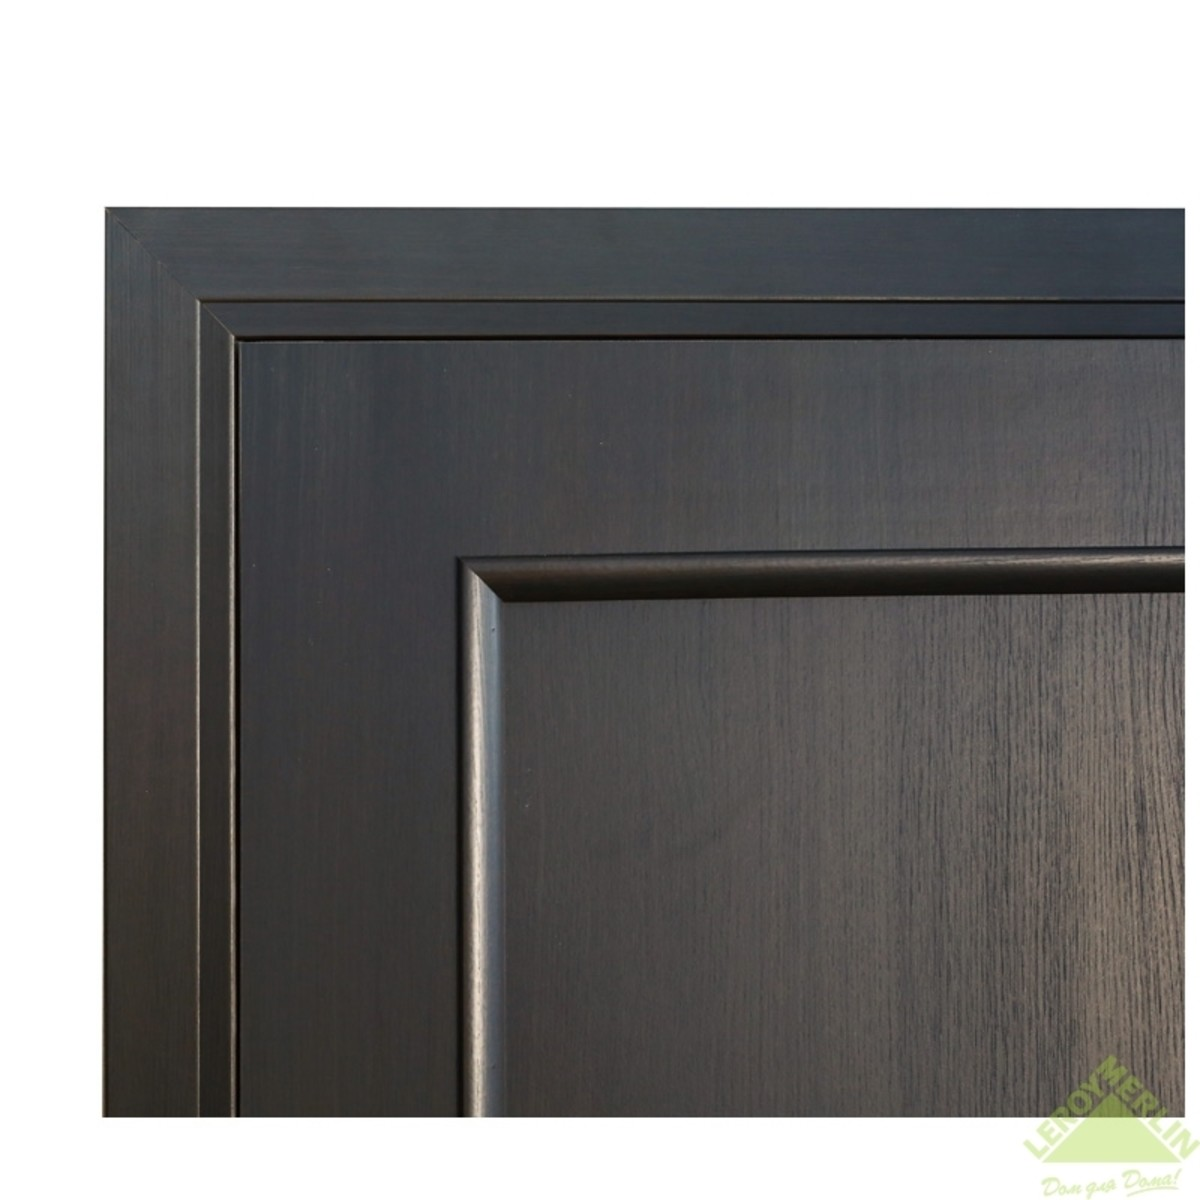 Дверь Межкомнатная Глухая Фортунато 820 700x2000 Венге